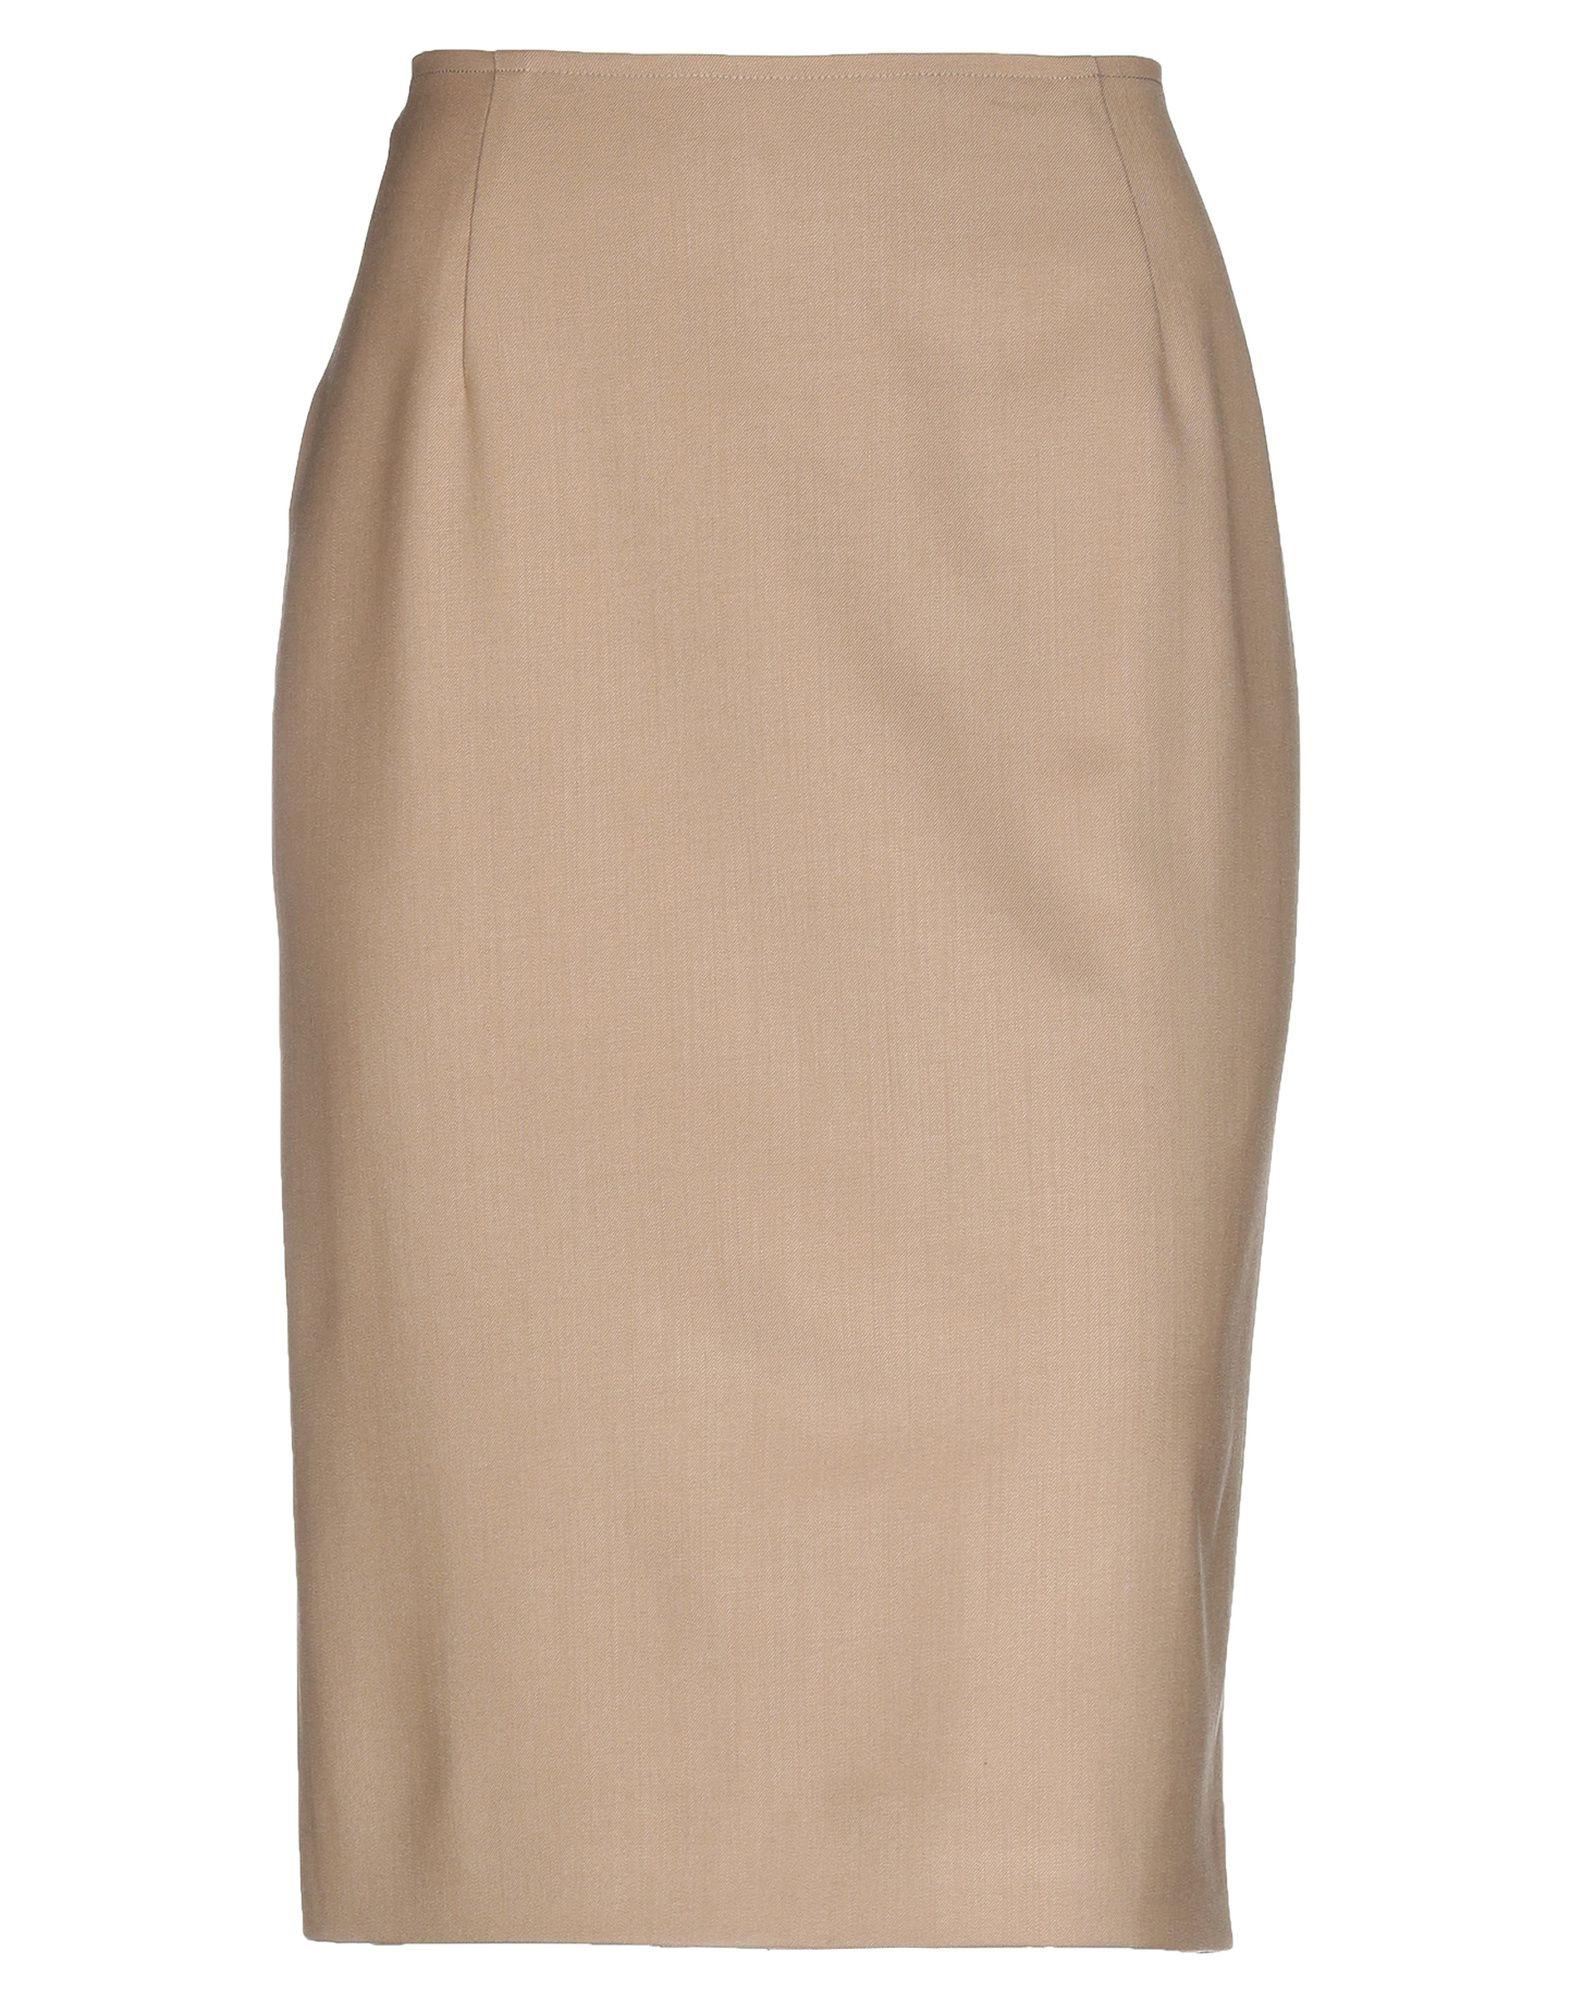 FONTANA COUTURE Юбка длиной 3/4 amen couture юбка длиной 3 4